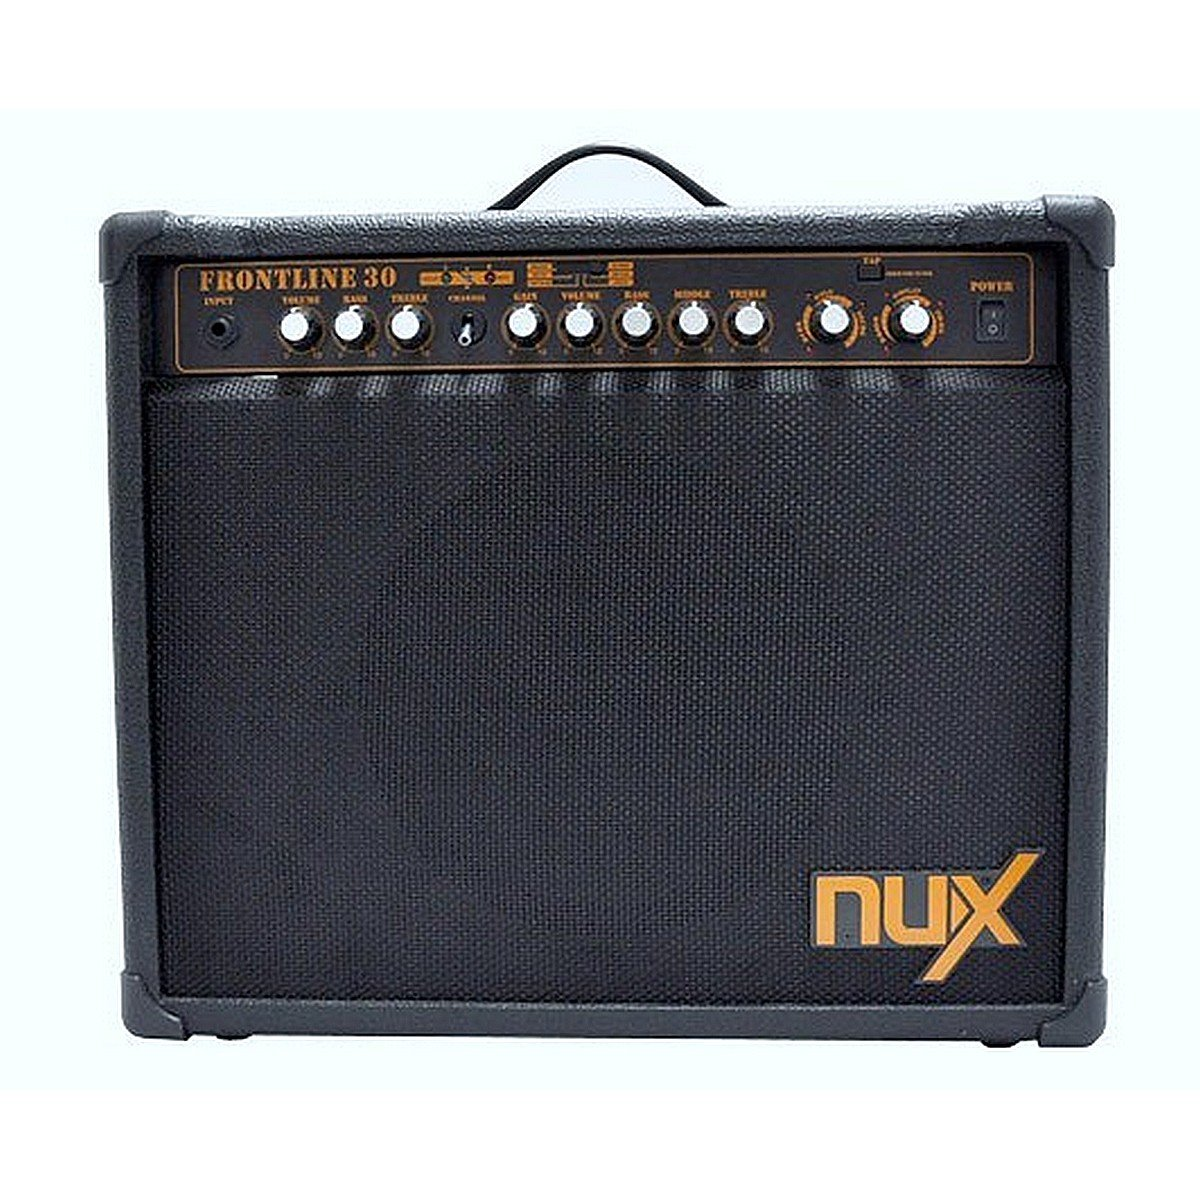 NUX Frontline 30 Electric Guitar Amplifier 30-Watt Clean and Distortion